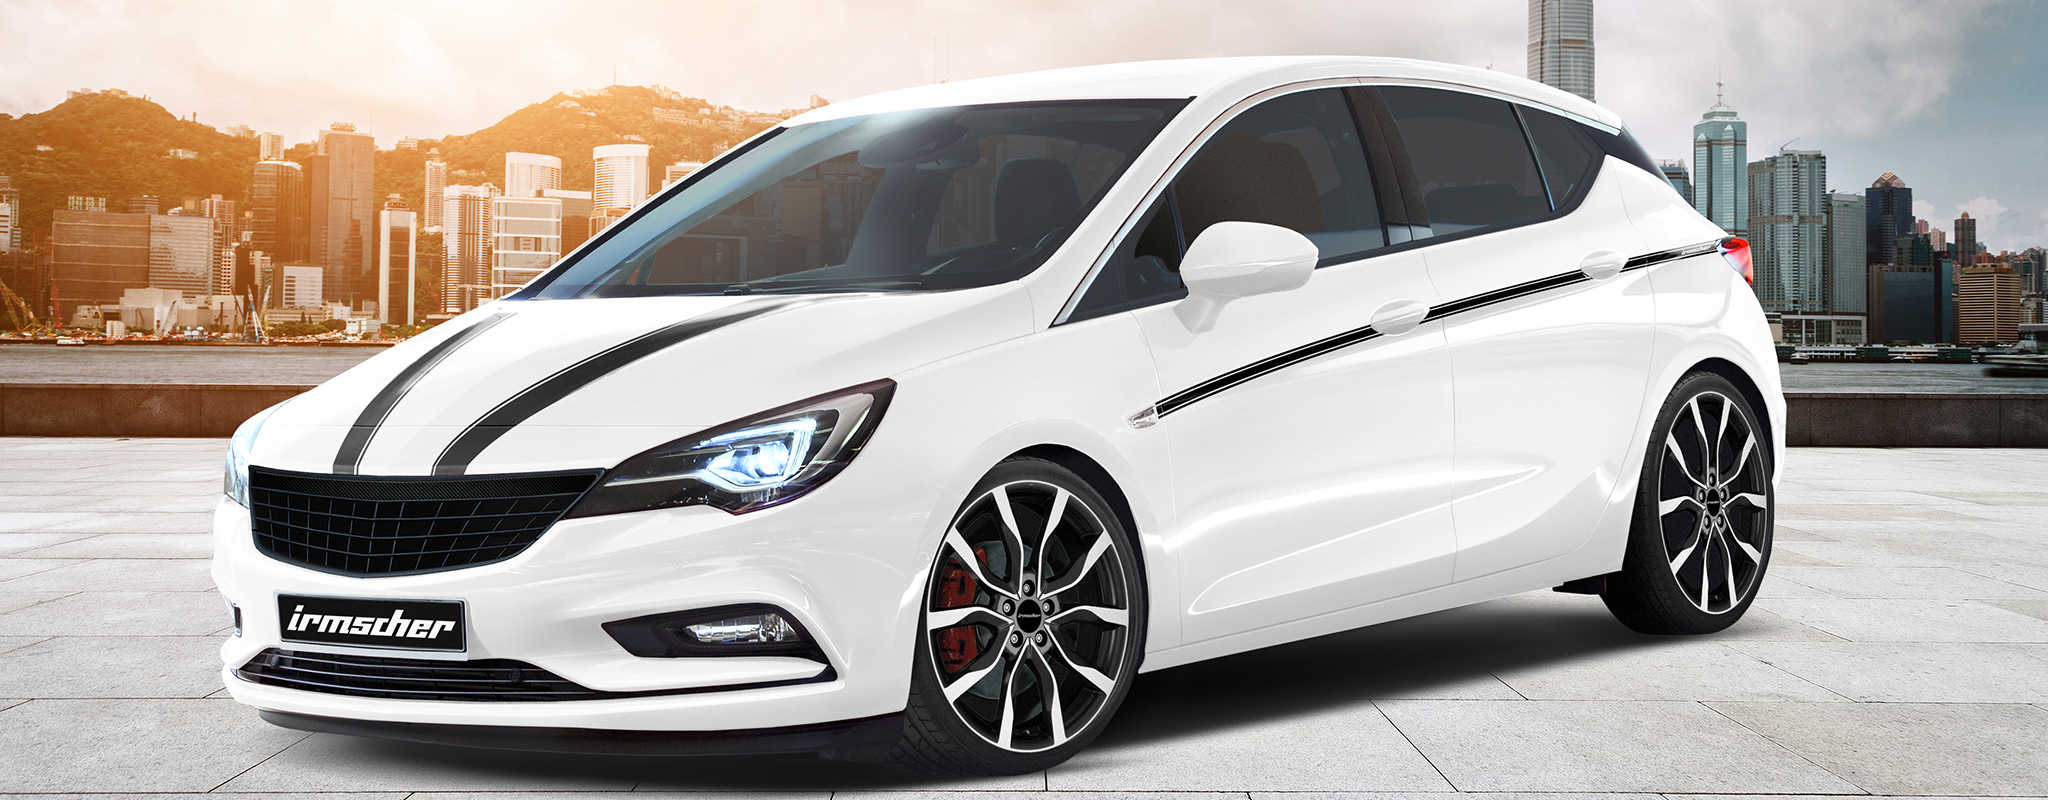 Astra K Bis Mj 2020 Astra Opel Vauxhall